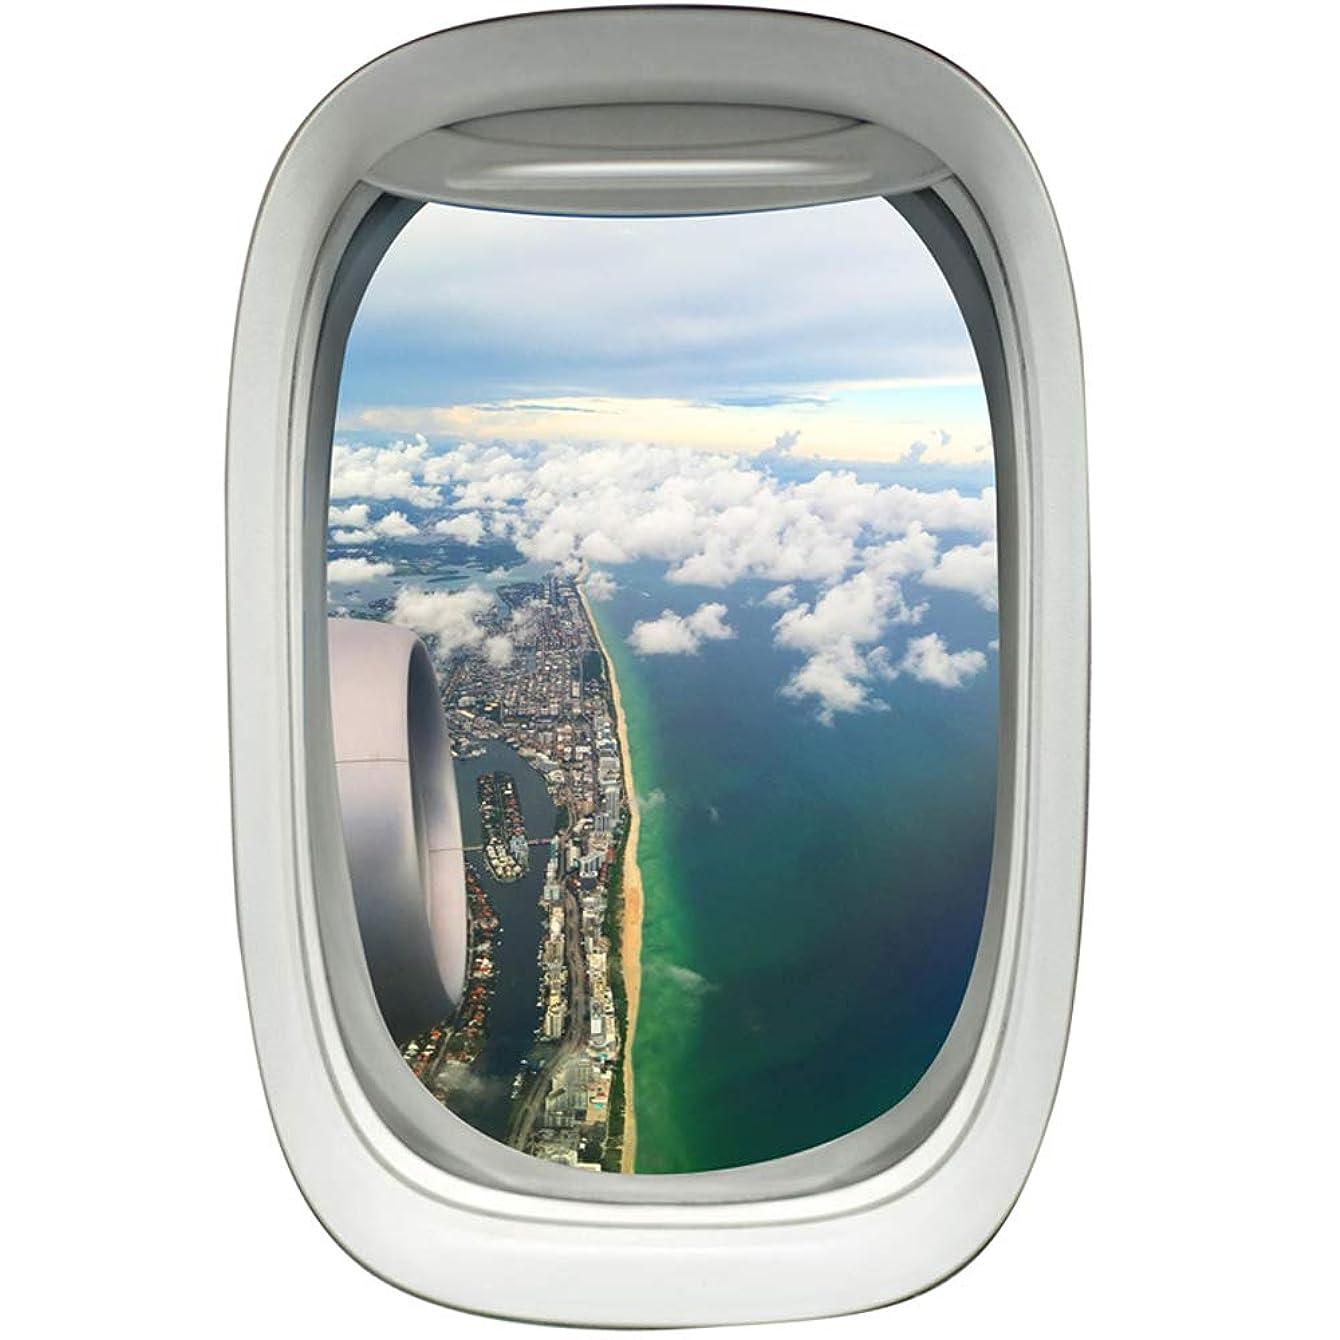 VWAQ Commercial Airplane Window Decal Beach Coastline Scene Aviation Decor PW8